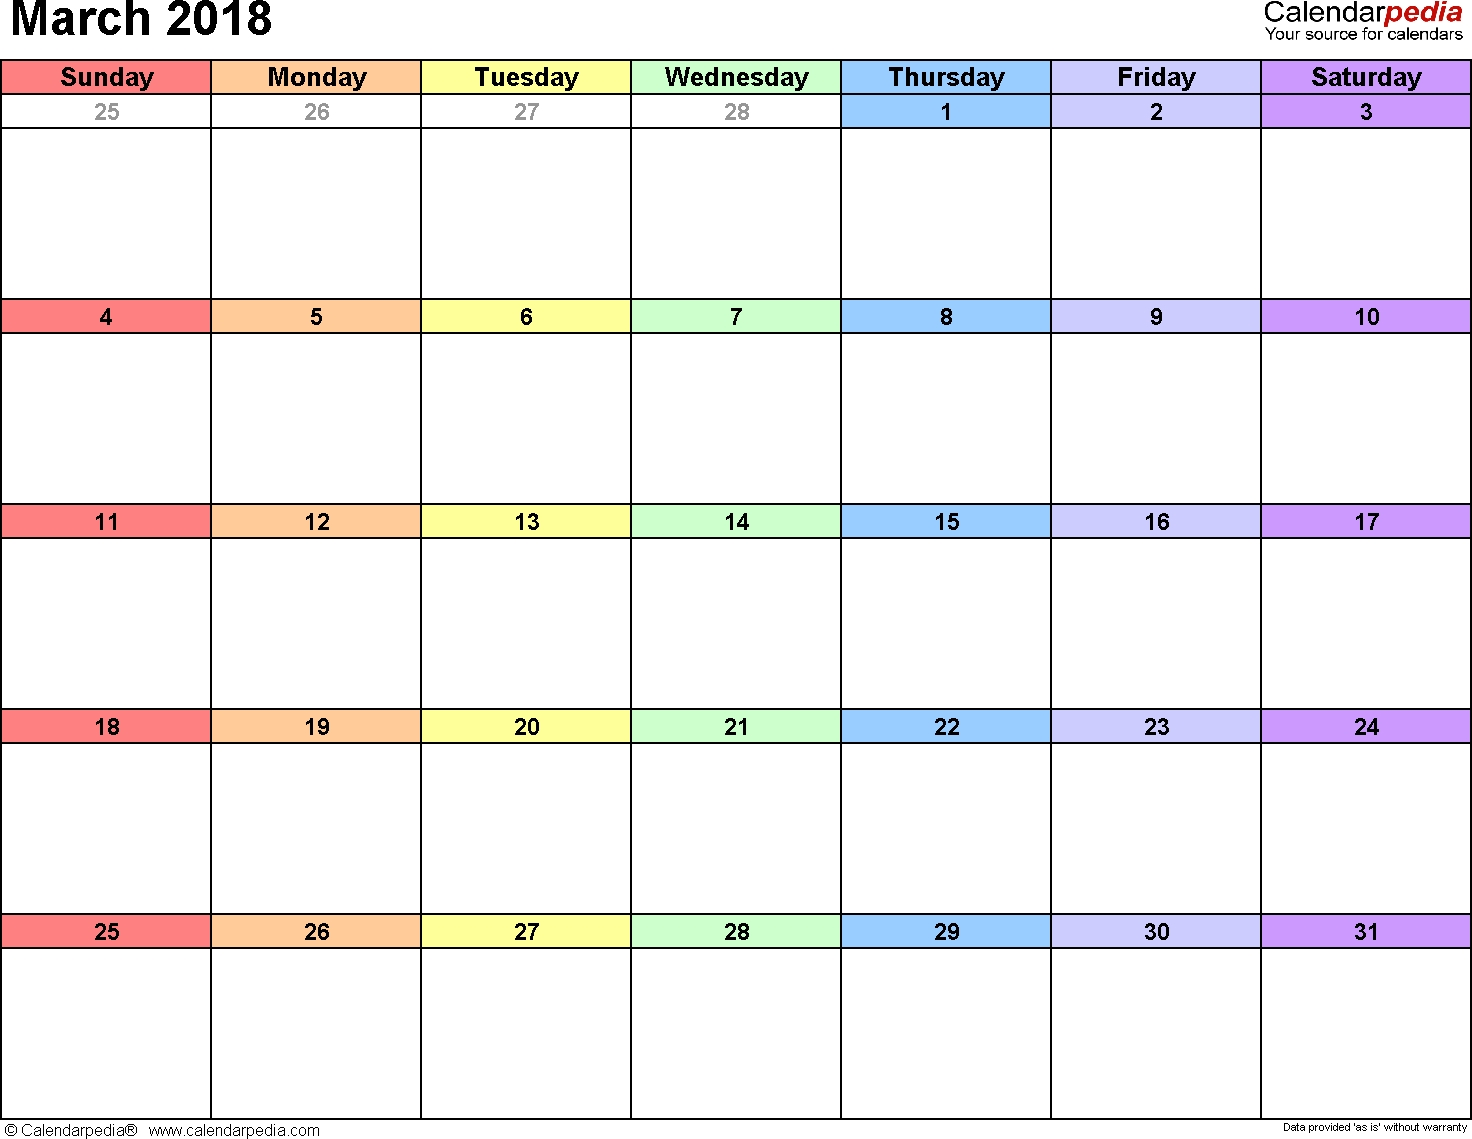 Calendarpedia Your Source For Calendars  Xjb